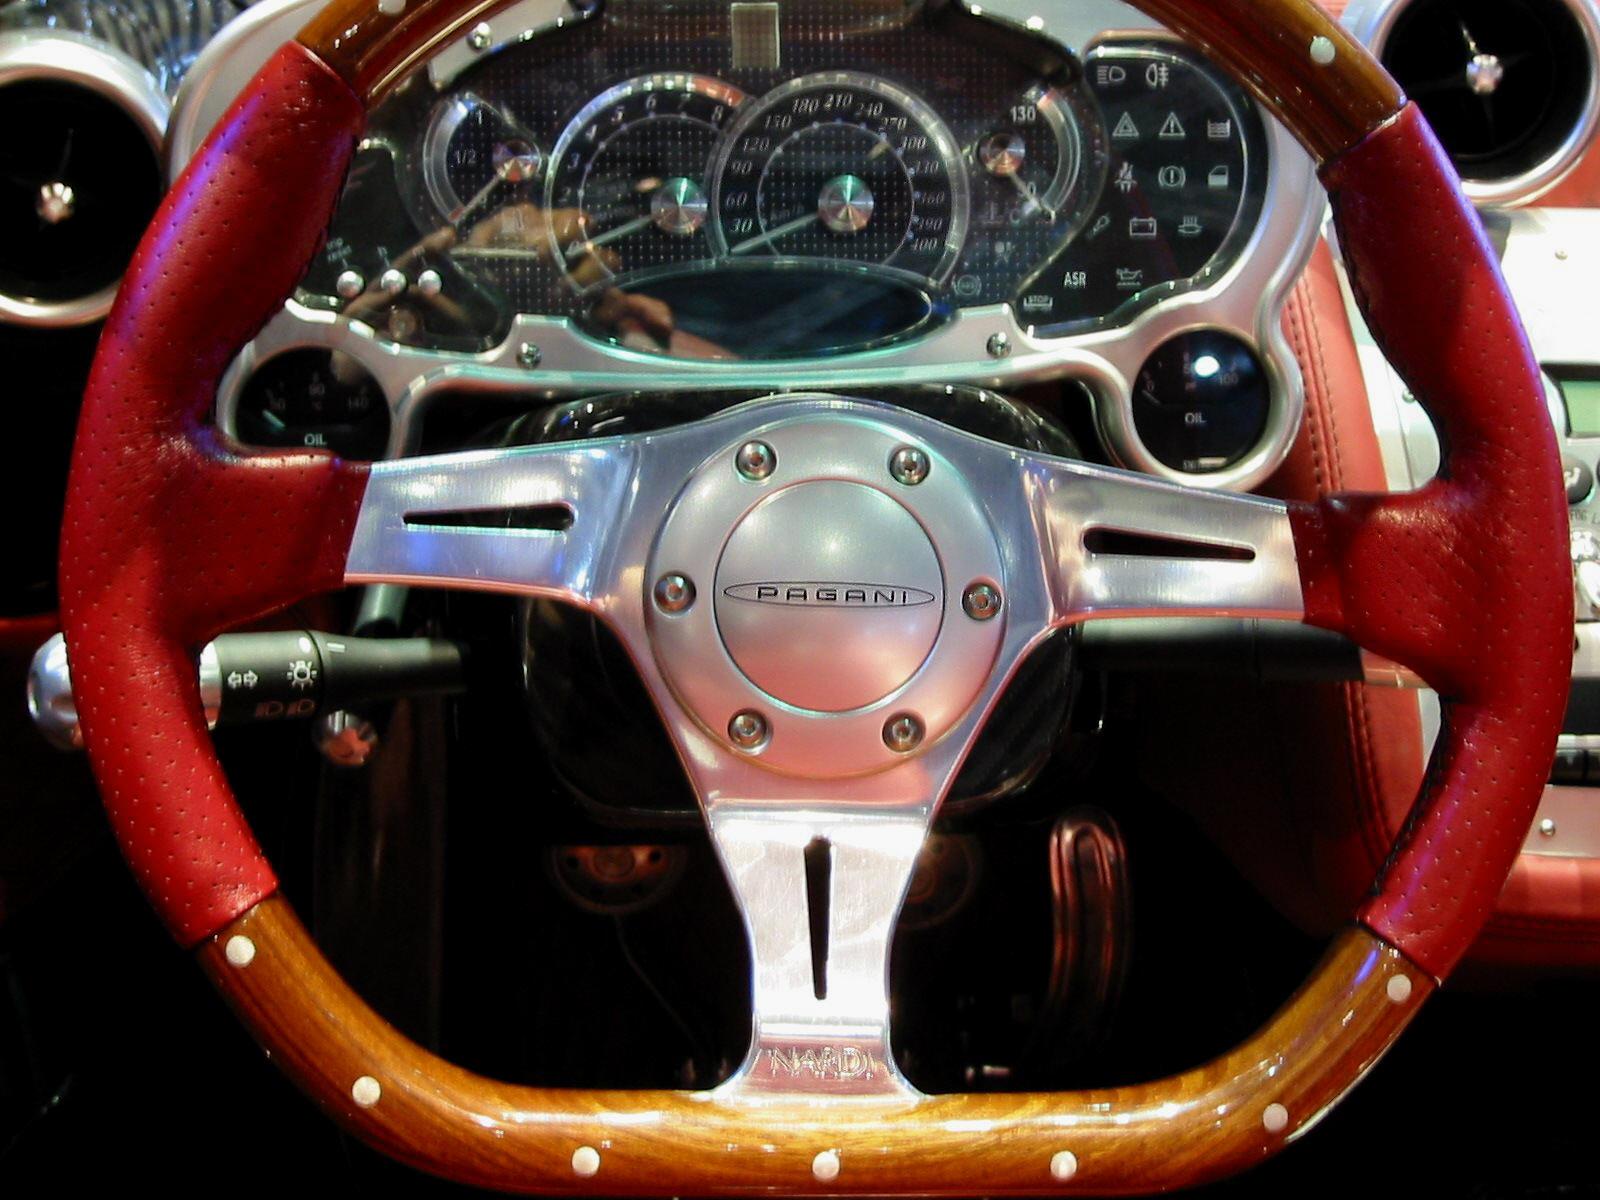 Chevy Cruze 2014 Price Wards 10 Best Interiors 2012 | Automotive General Topics ...